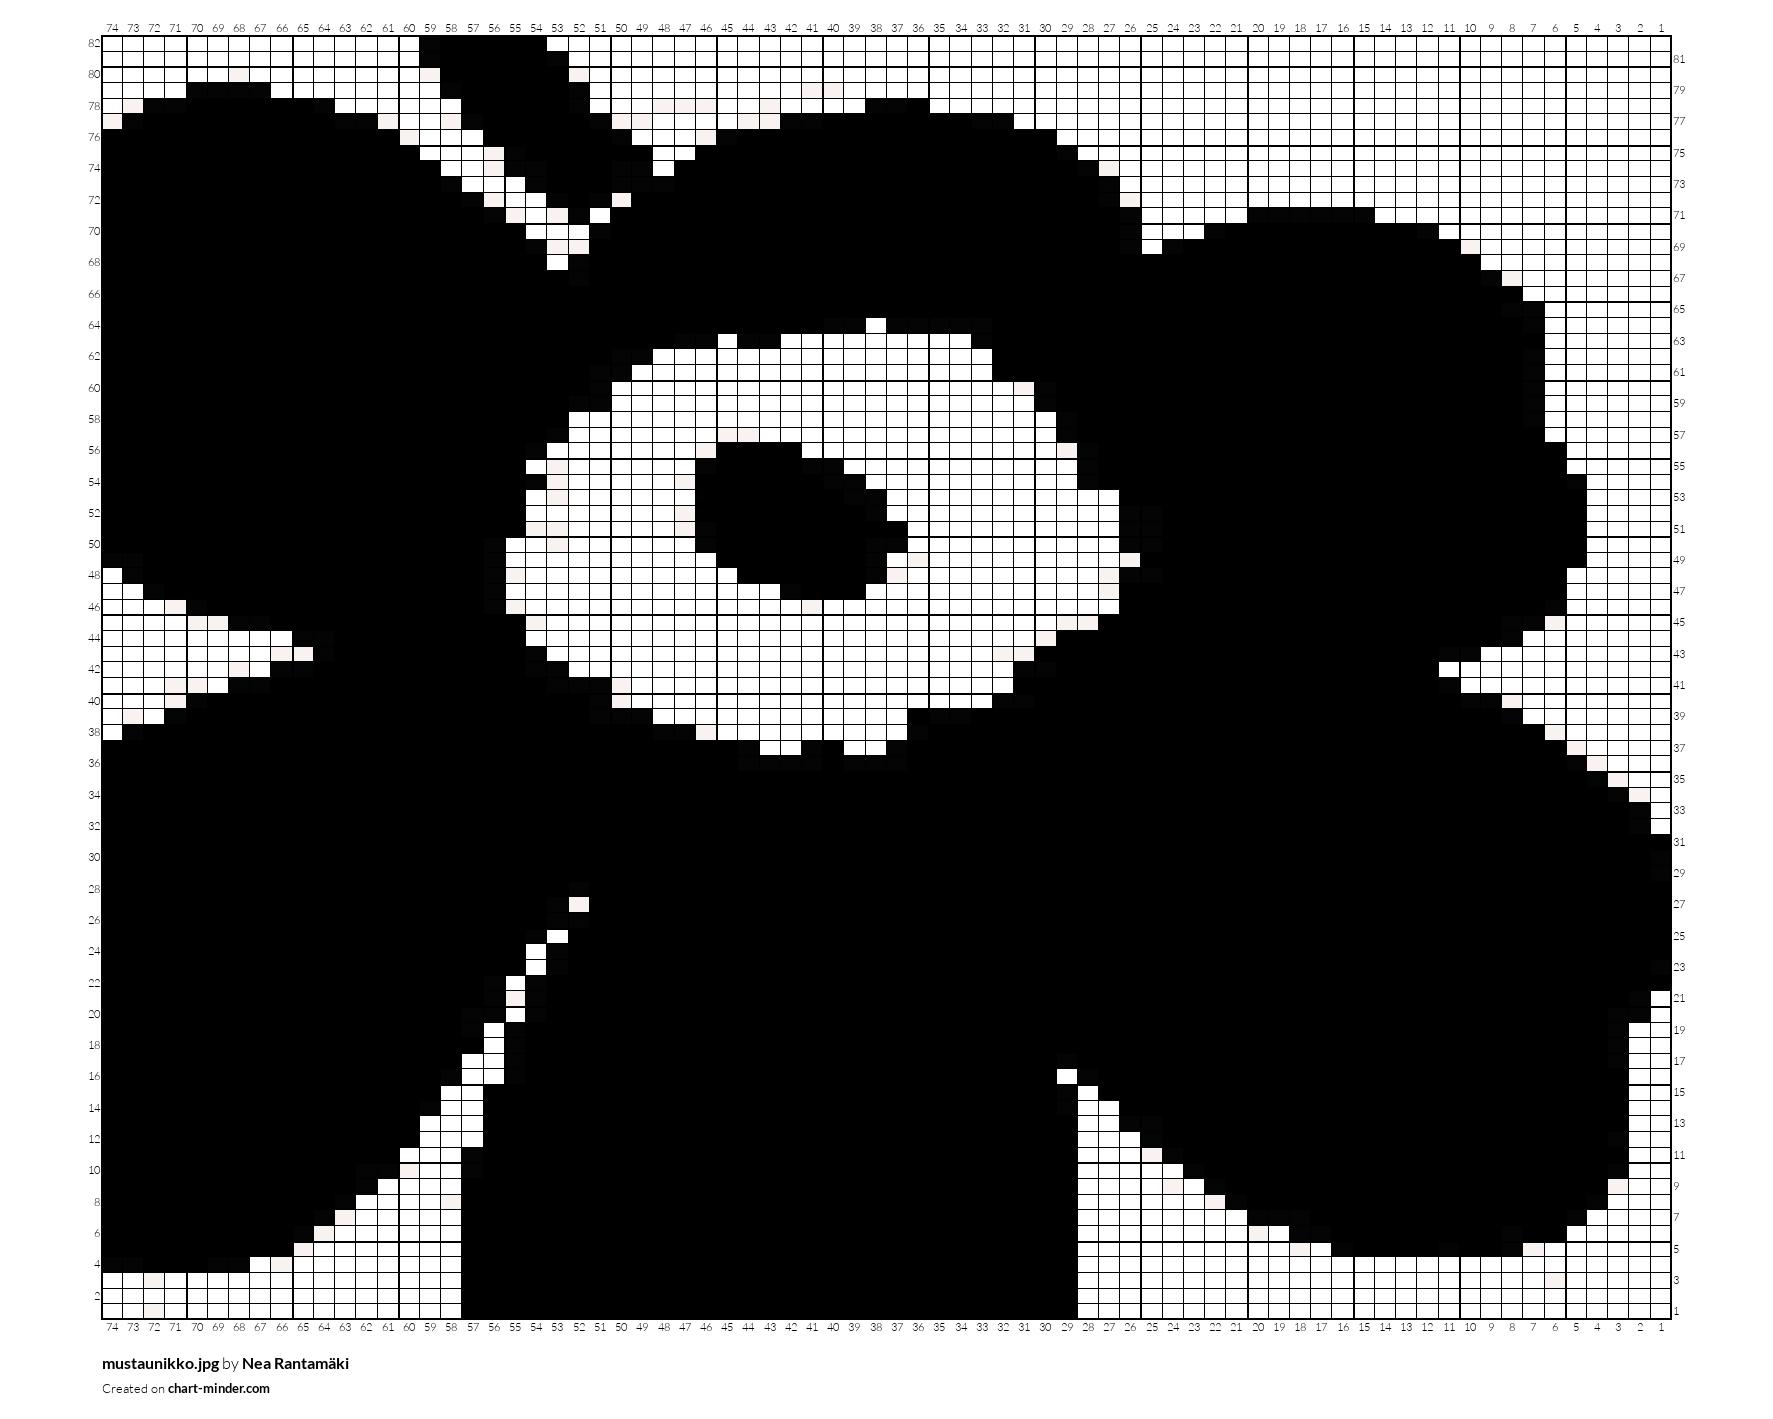 mustaunikko.jpg